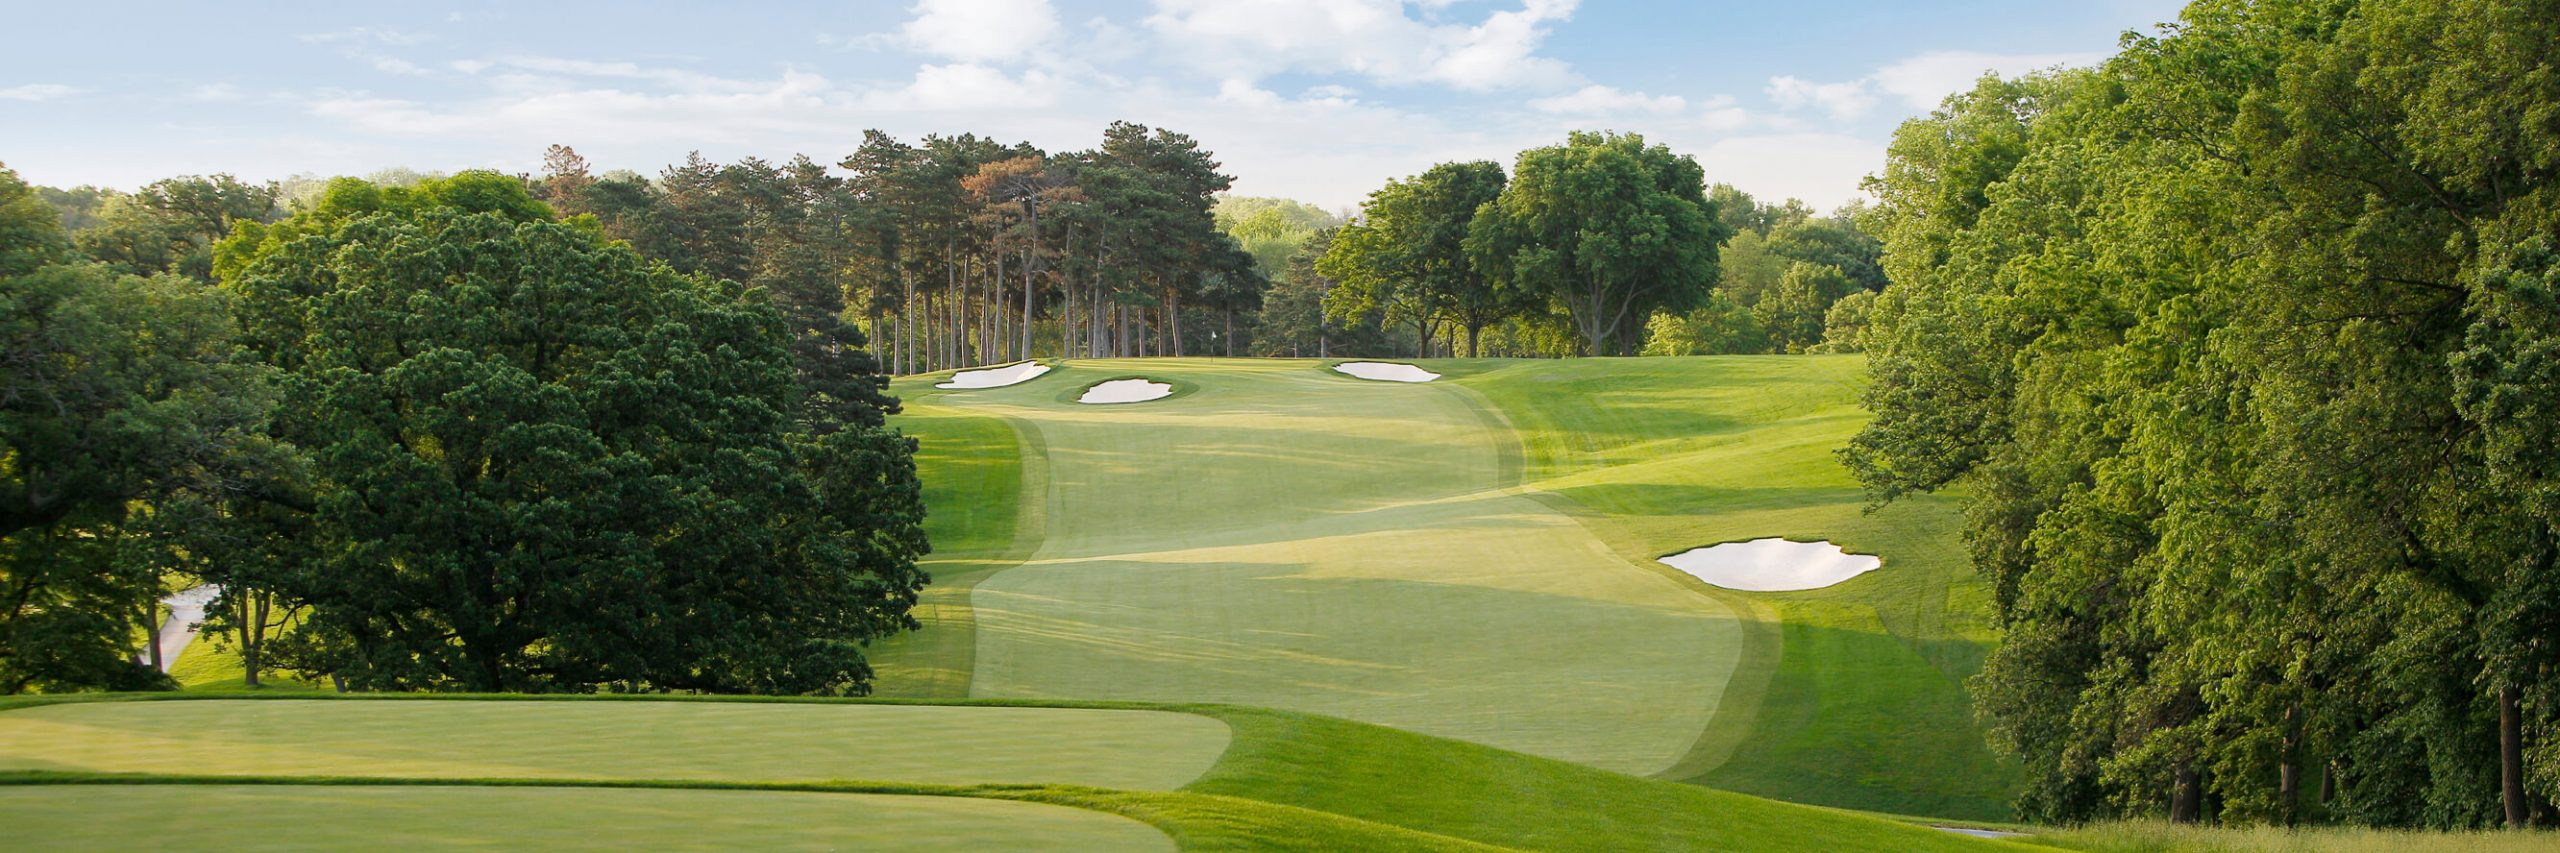 Golf Course Image - Omaha Country Club No. 18